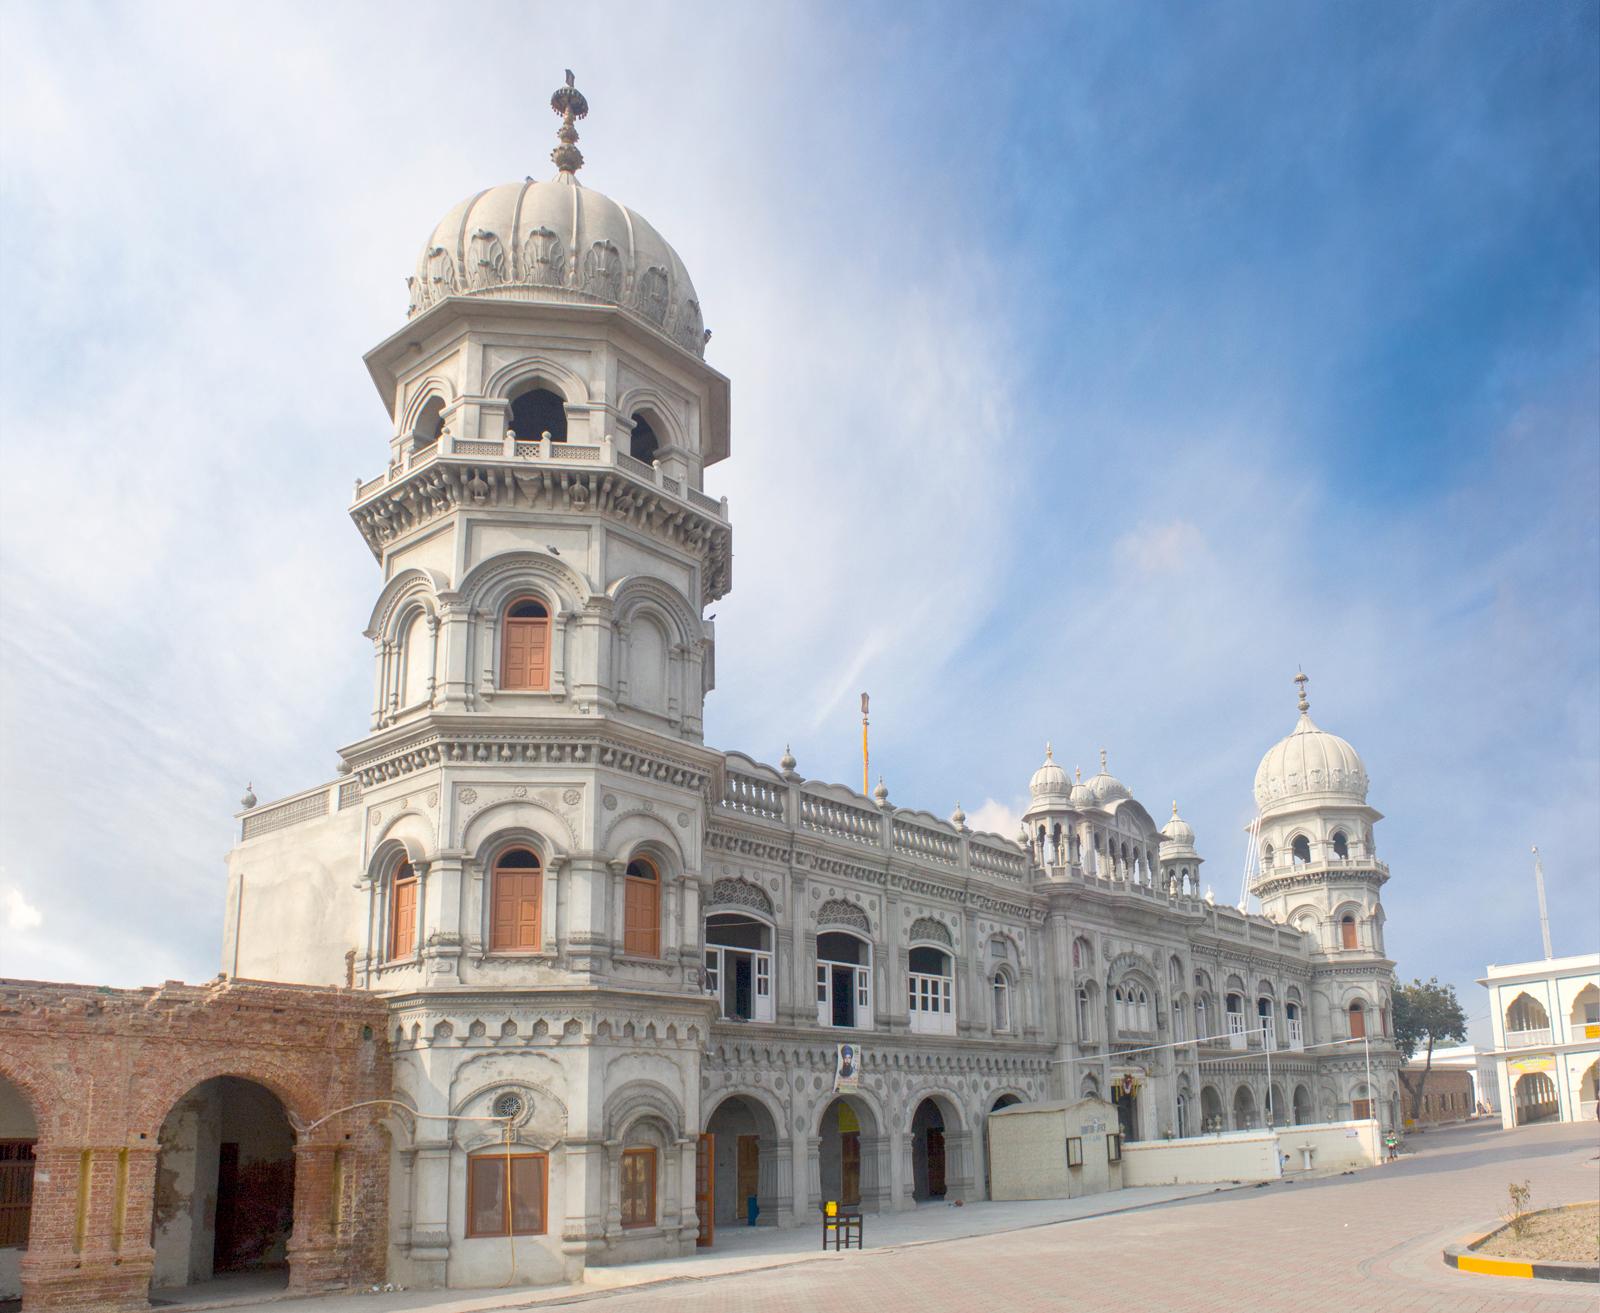 Birthplace of Baba Guru Nanak, Pakistan